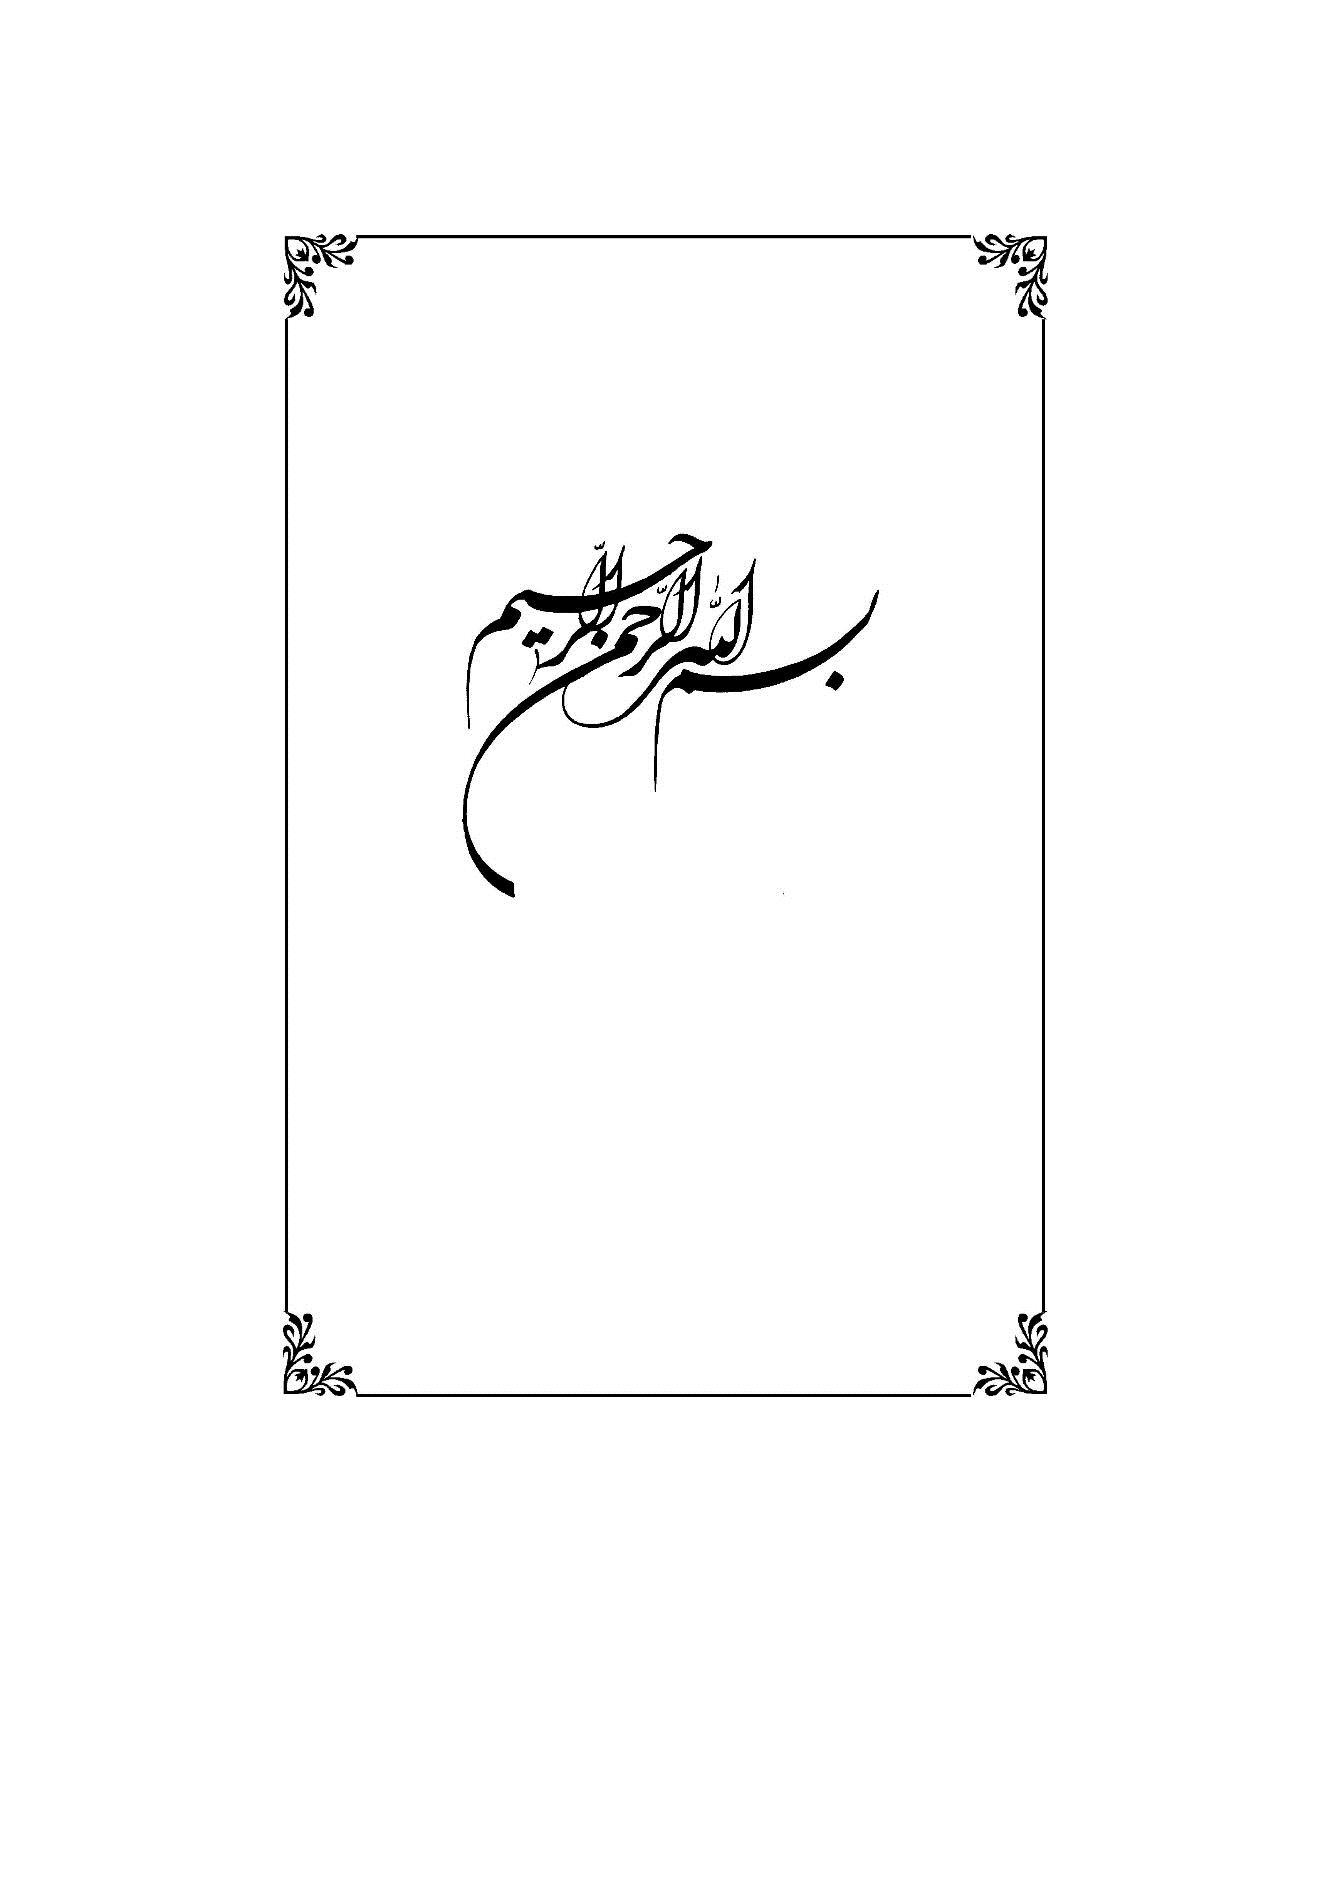 \\archive1.icpikw.ir\Archive 51\Book\Naha-portal-ketabkhone-archive\پرتال-----جدید--95.05.23\tafkik-fail-------jadid\2032-tahrir-alvasile-j1\2032-tafkik\Pages from 2033.jpg